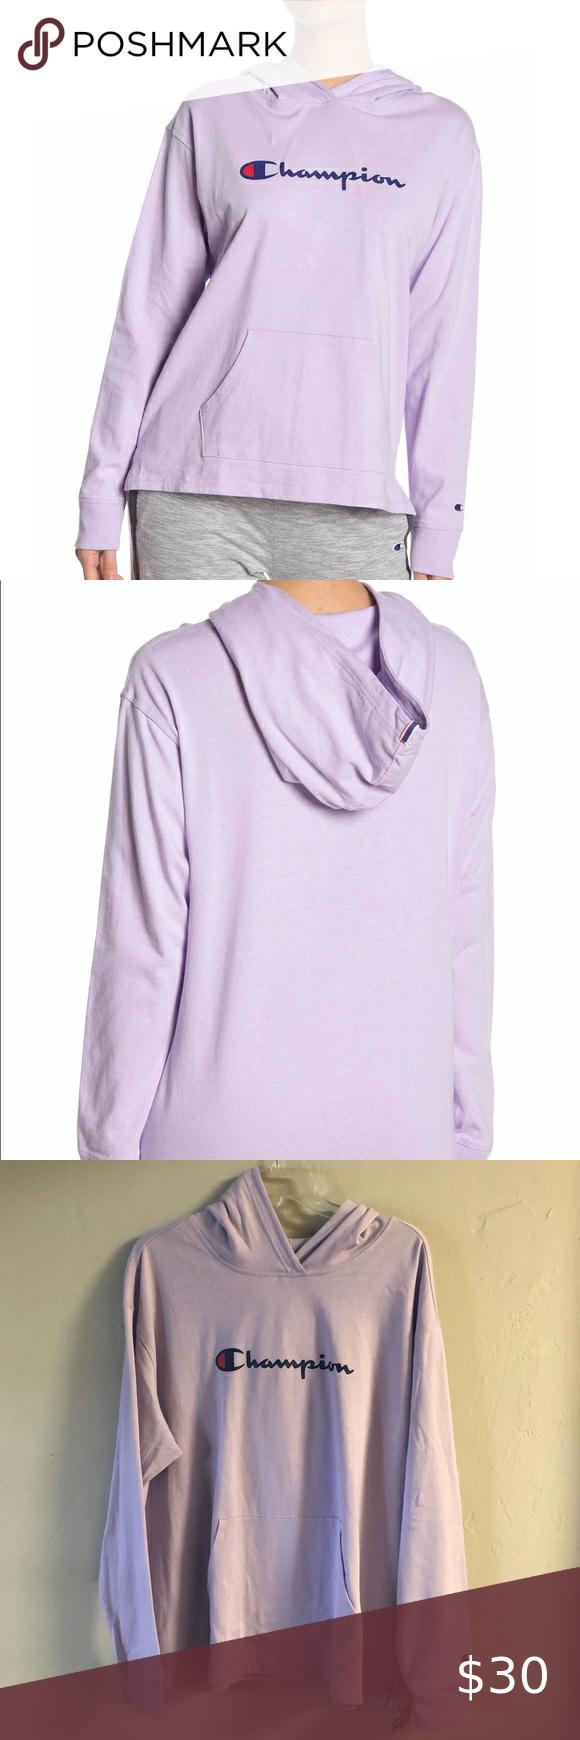 Champion Logo Hoodie Sweatshirt Nwt 2xl Violet Sweatshirts Hoodie Sweatshirts Long Sleeve Tshirt Men [ 1740 x 580 Pixel ]